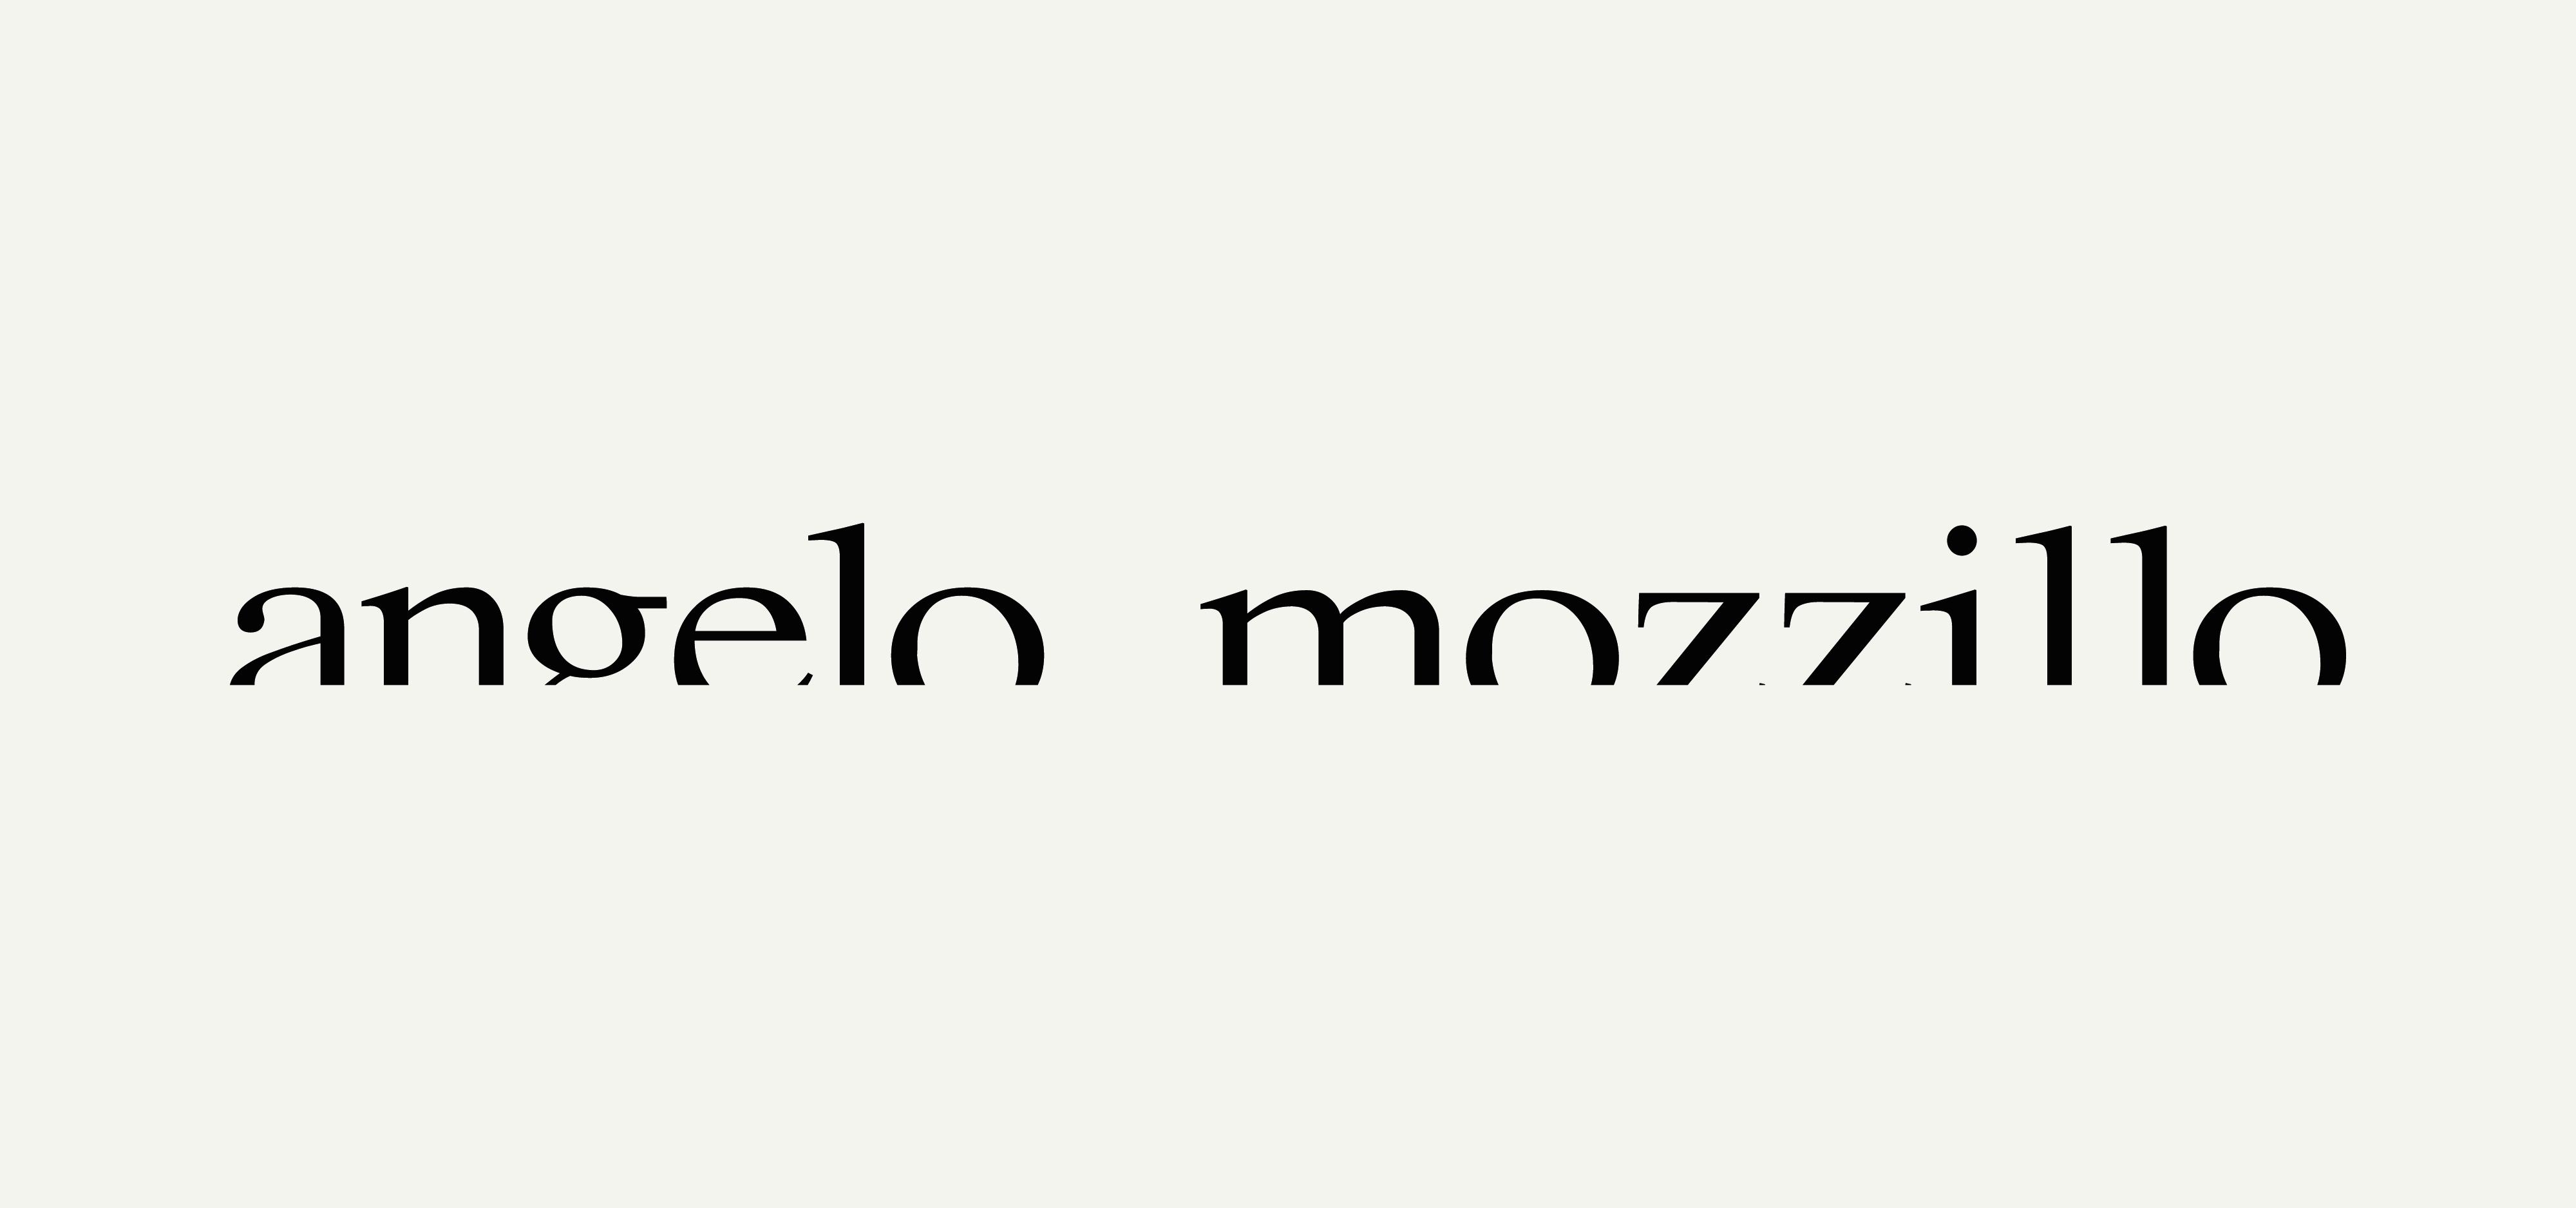 mozzillo-04